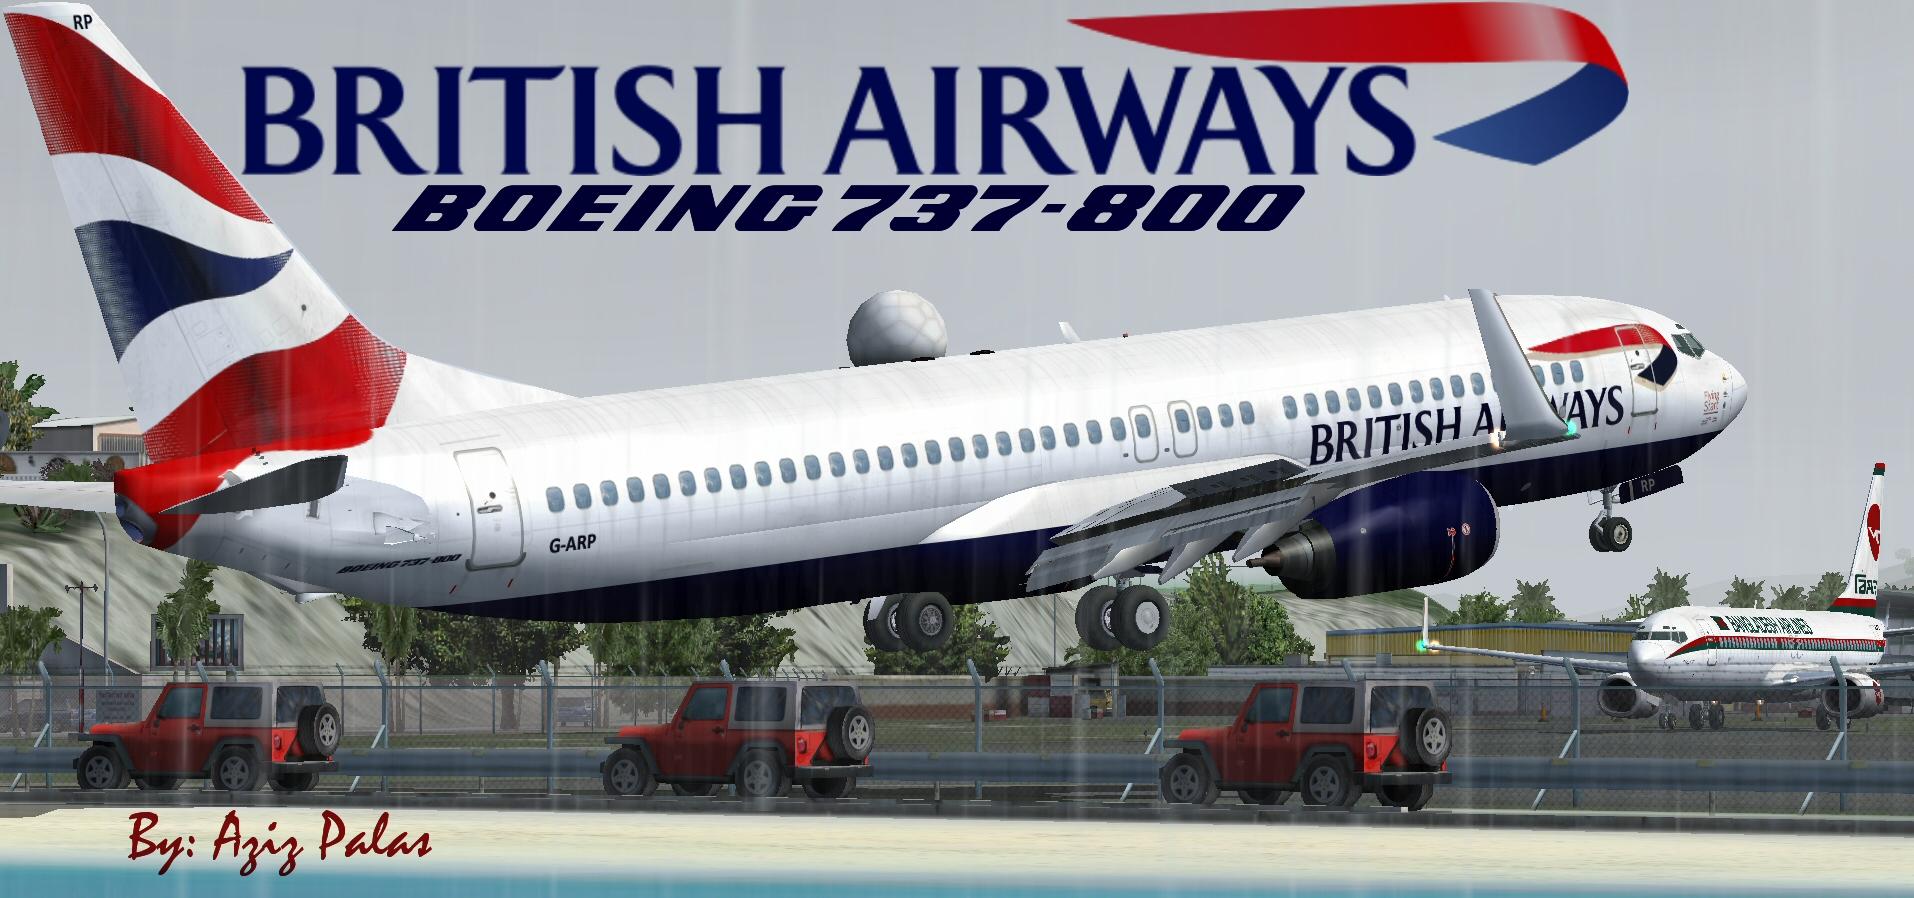 fs-freeware net - FSX British Airways B737-800